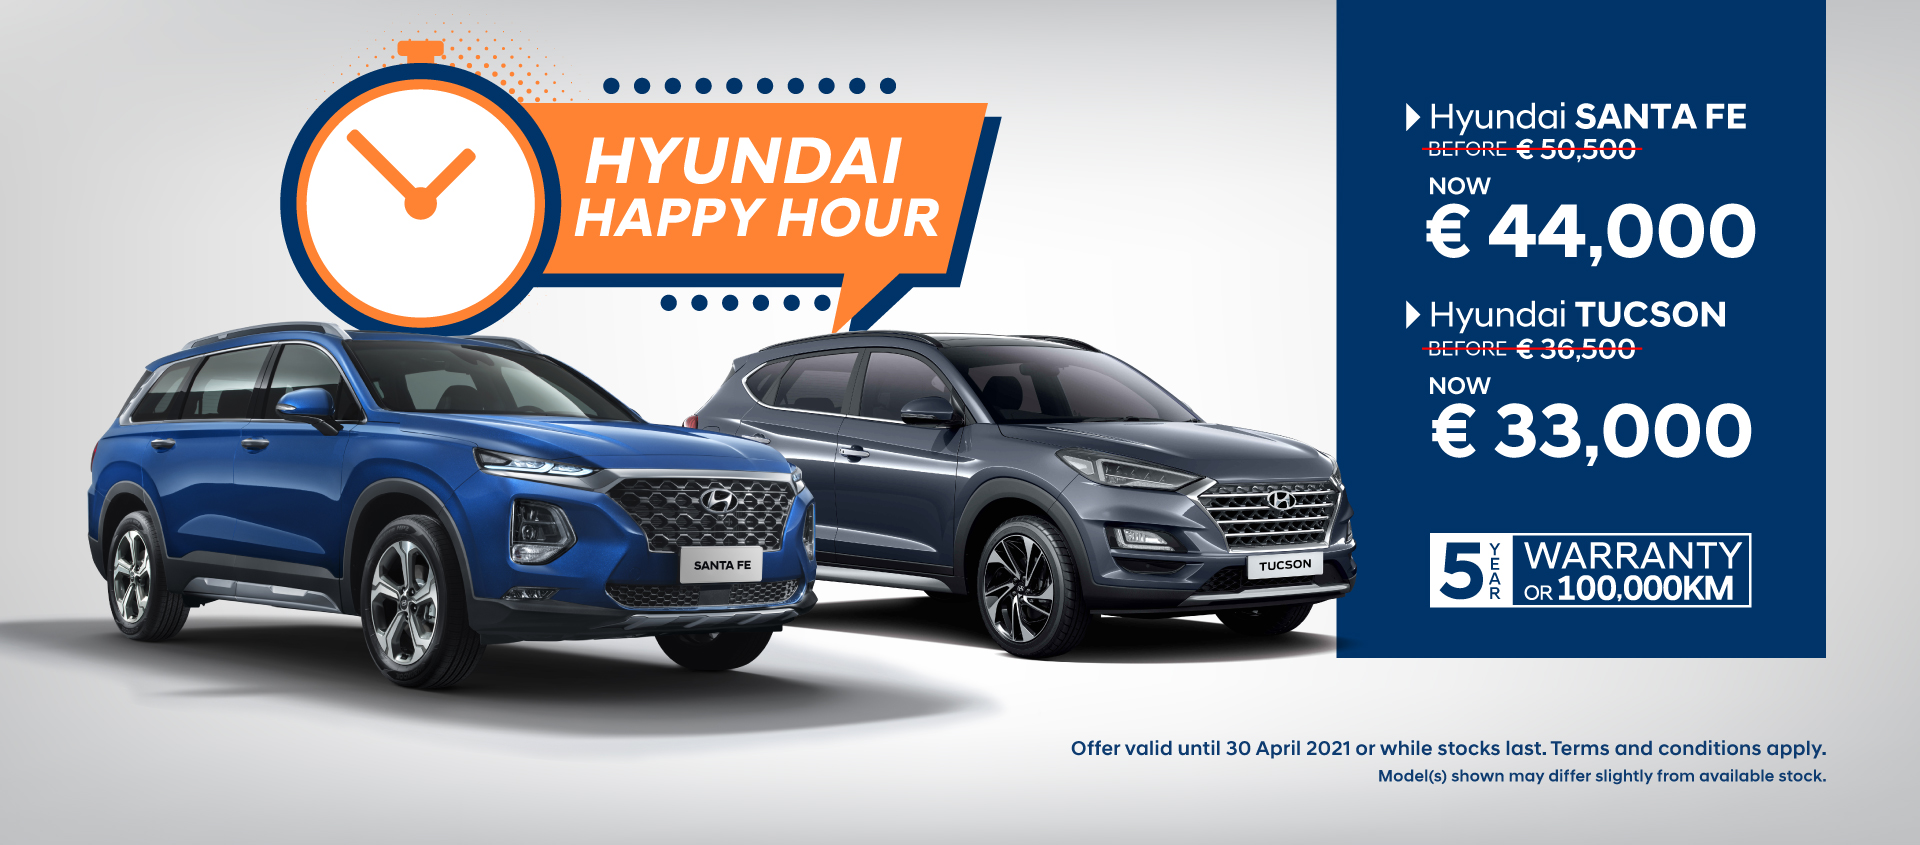 Hyundai Happy Hour